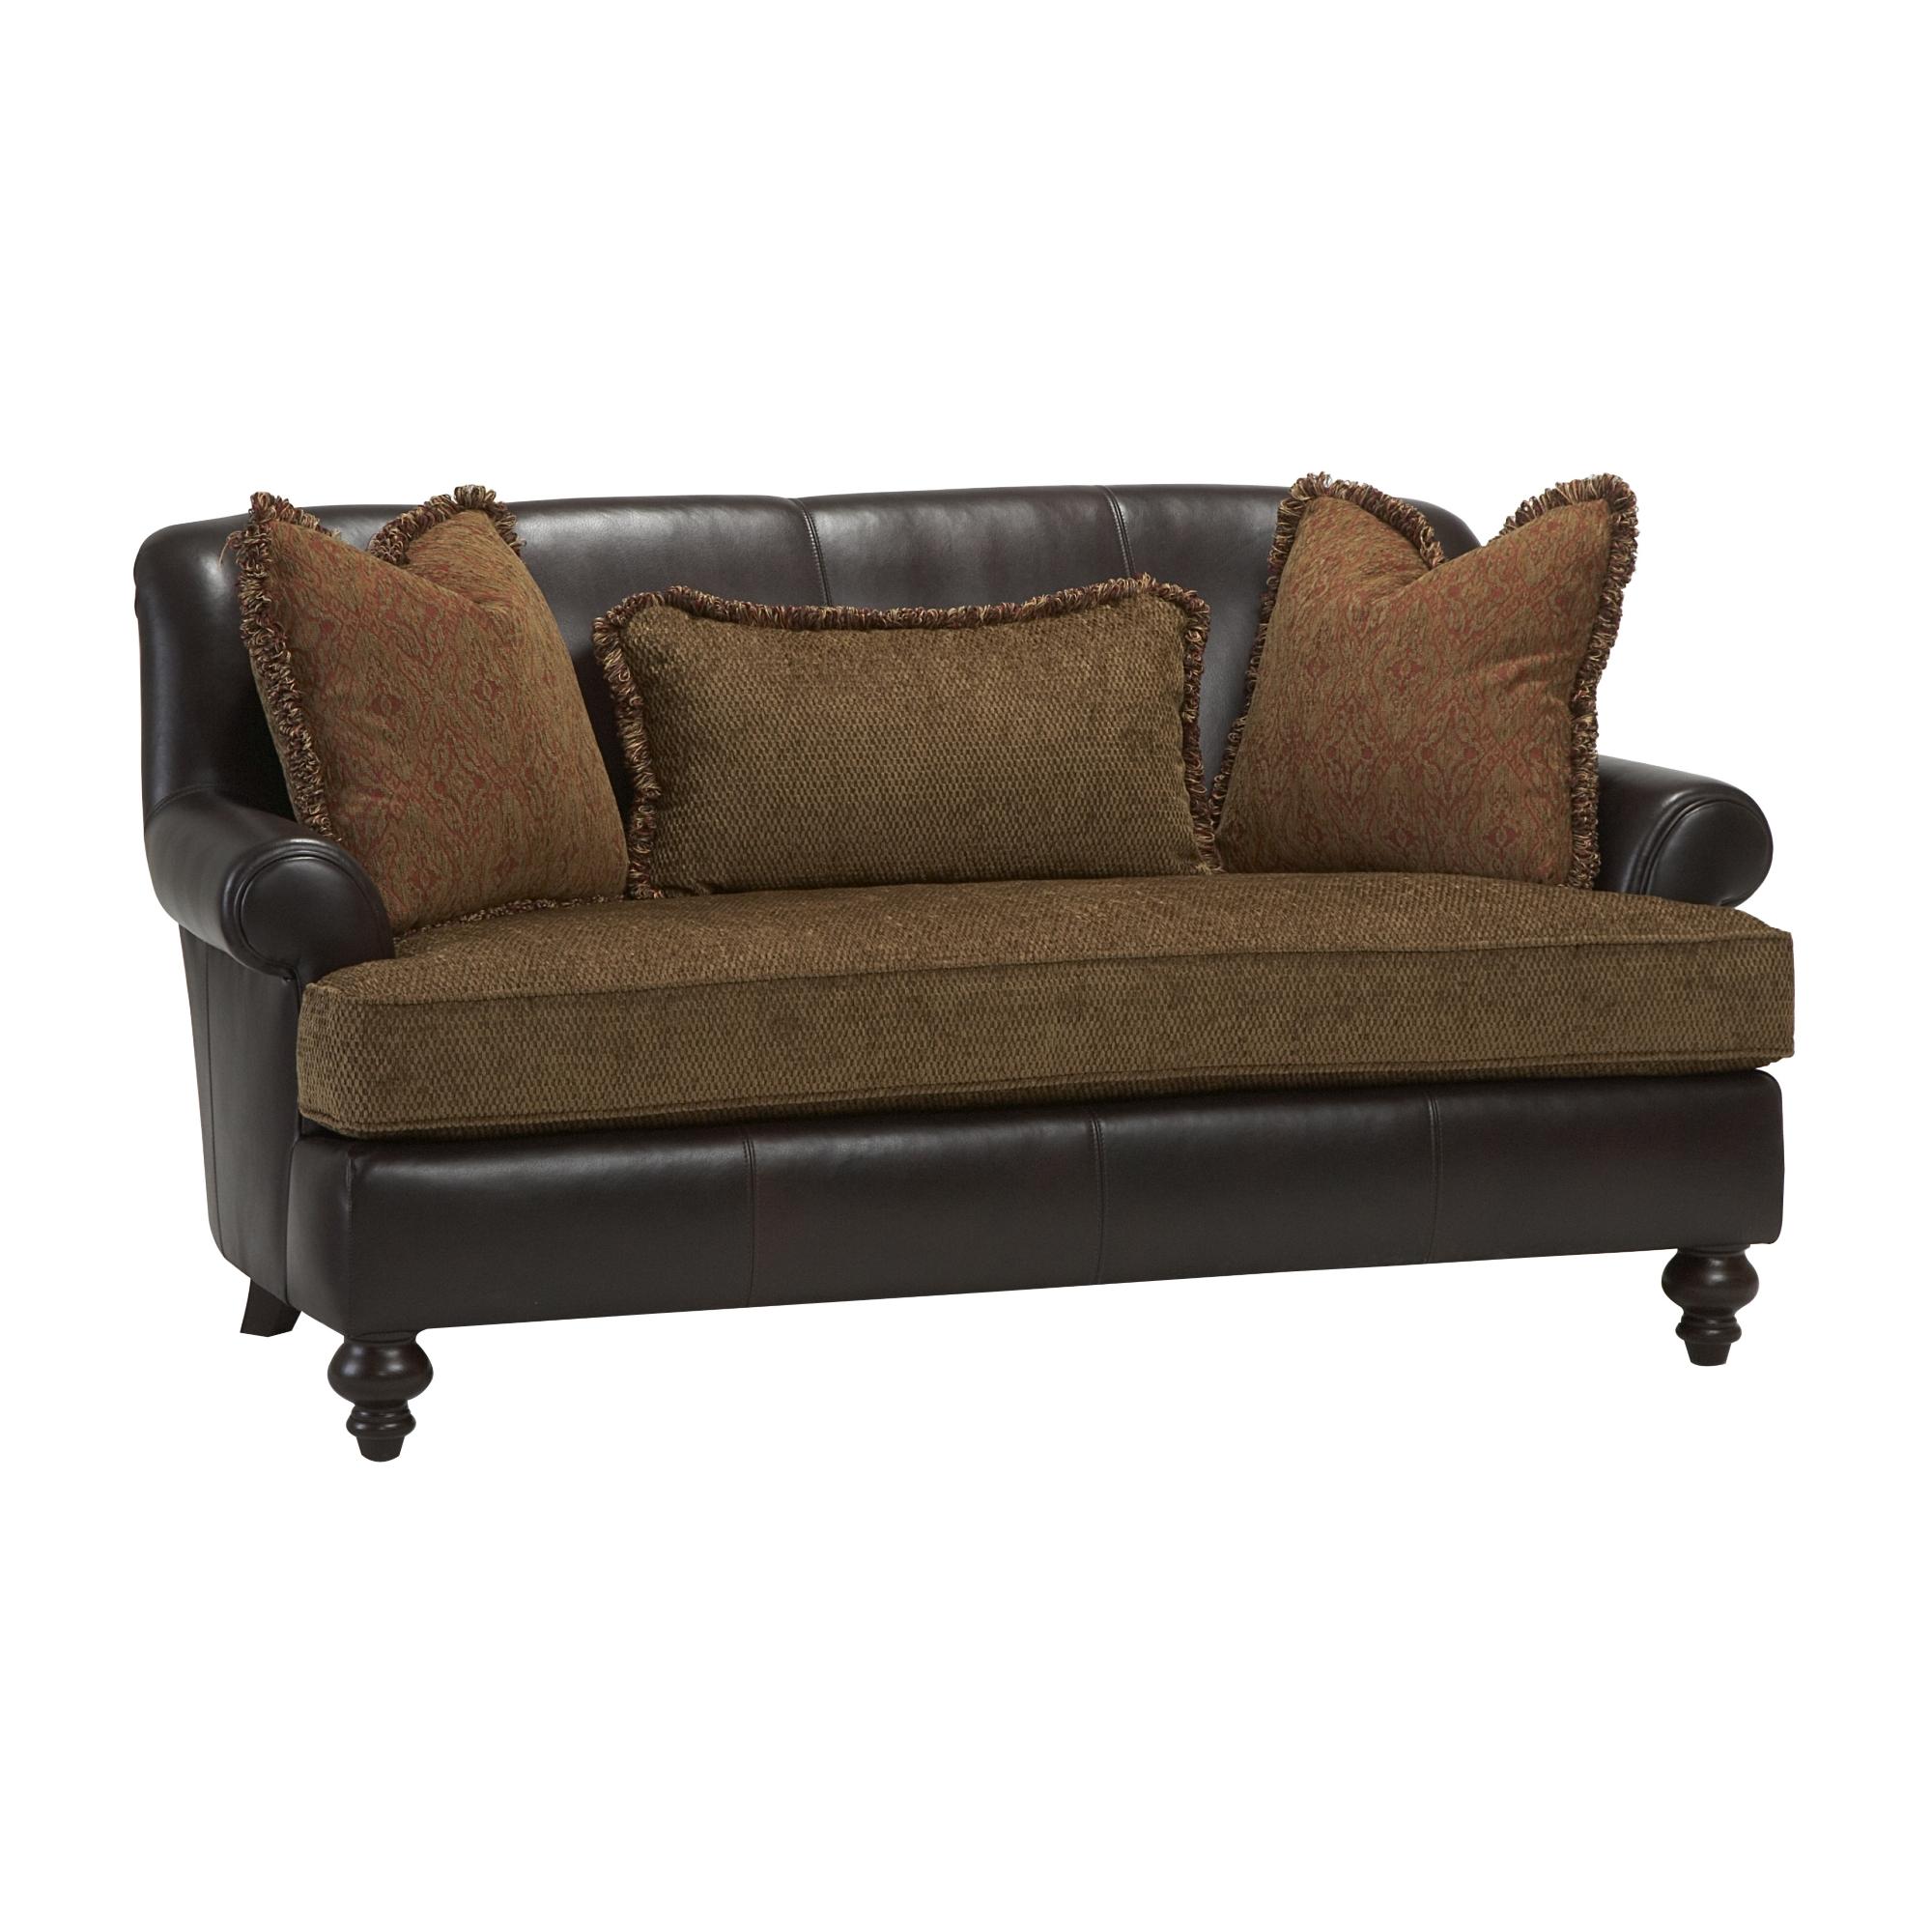 Bernhardt Sofa Leather And Fabric 100 Gray Velvet Tufted